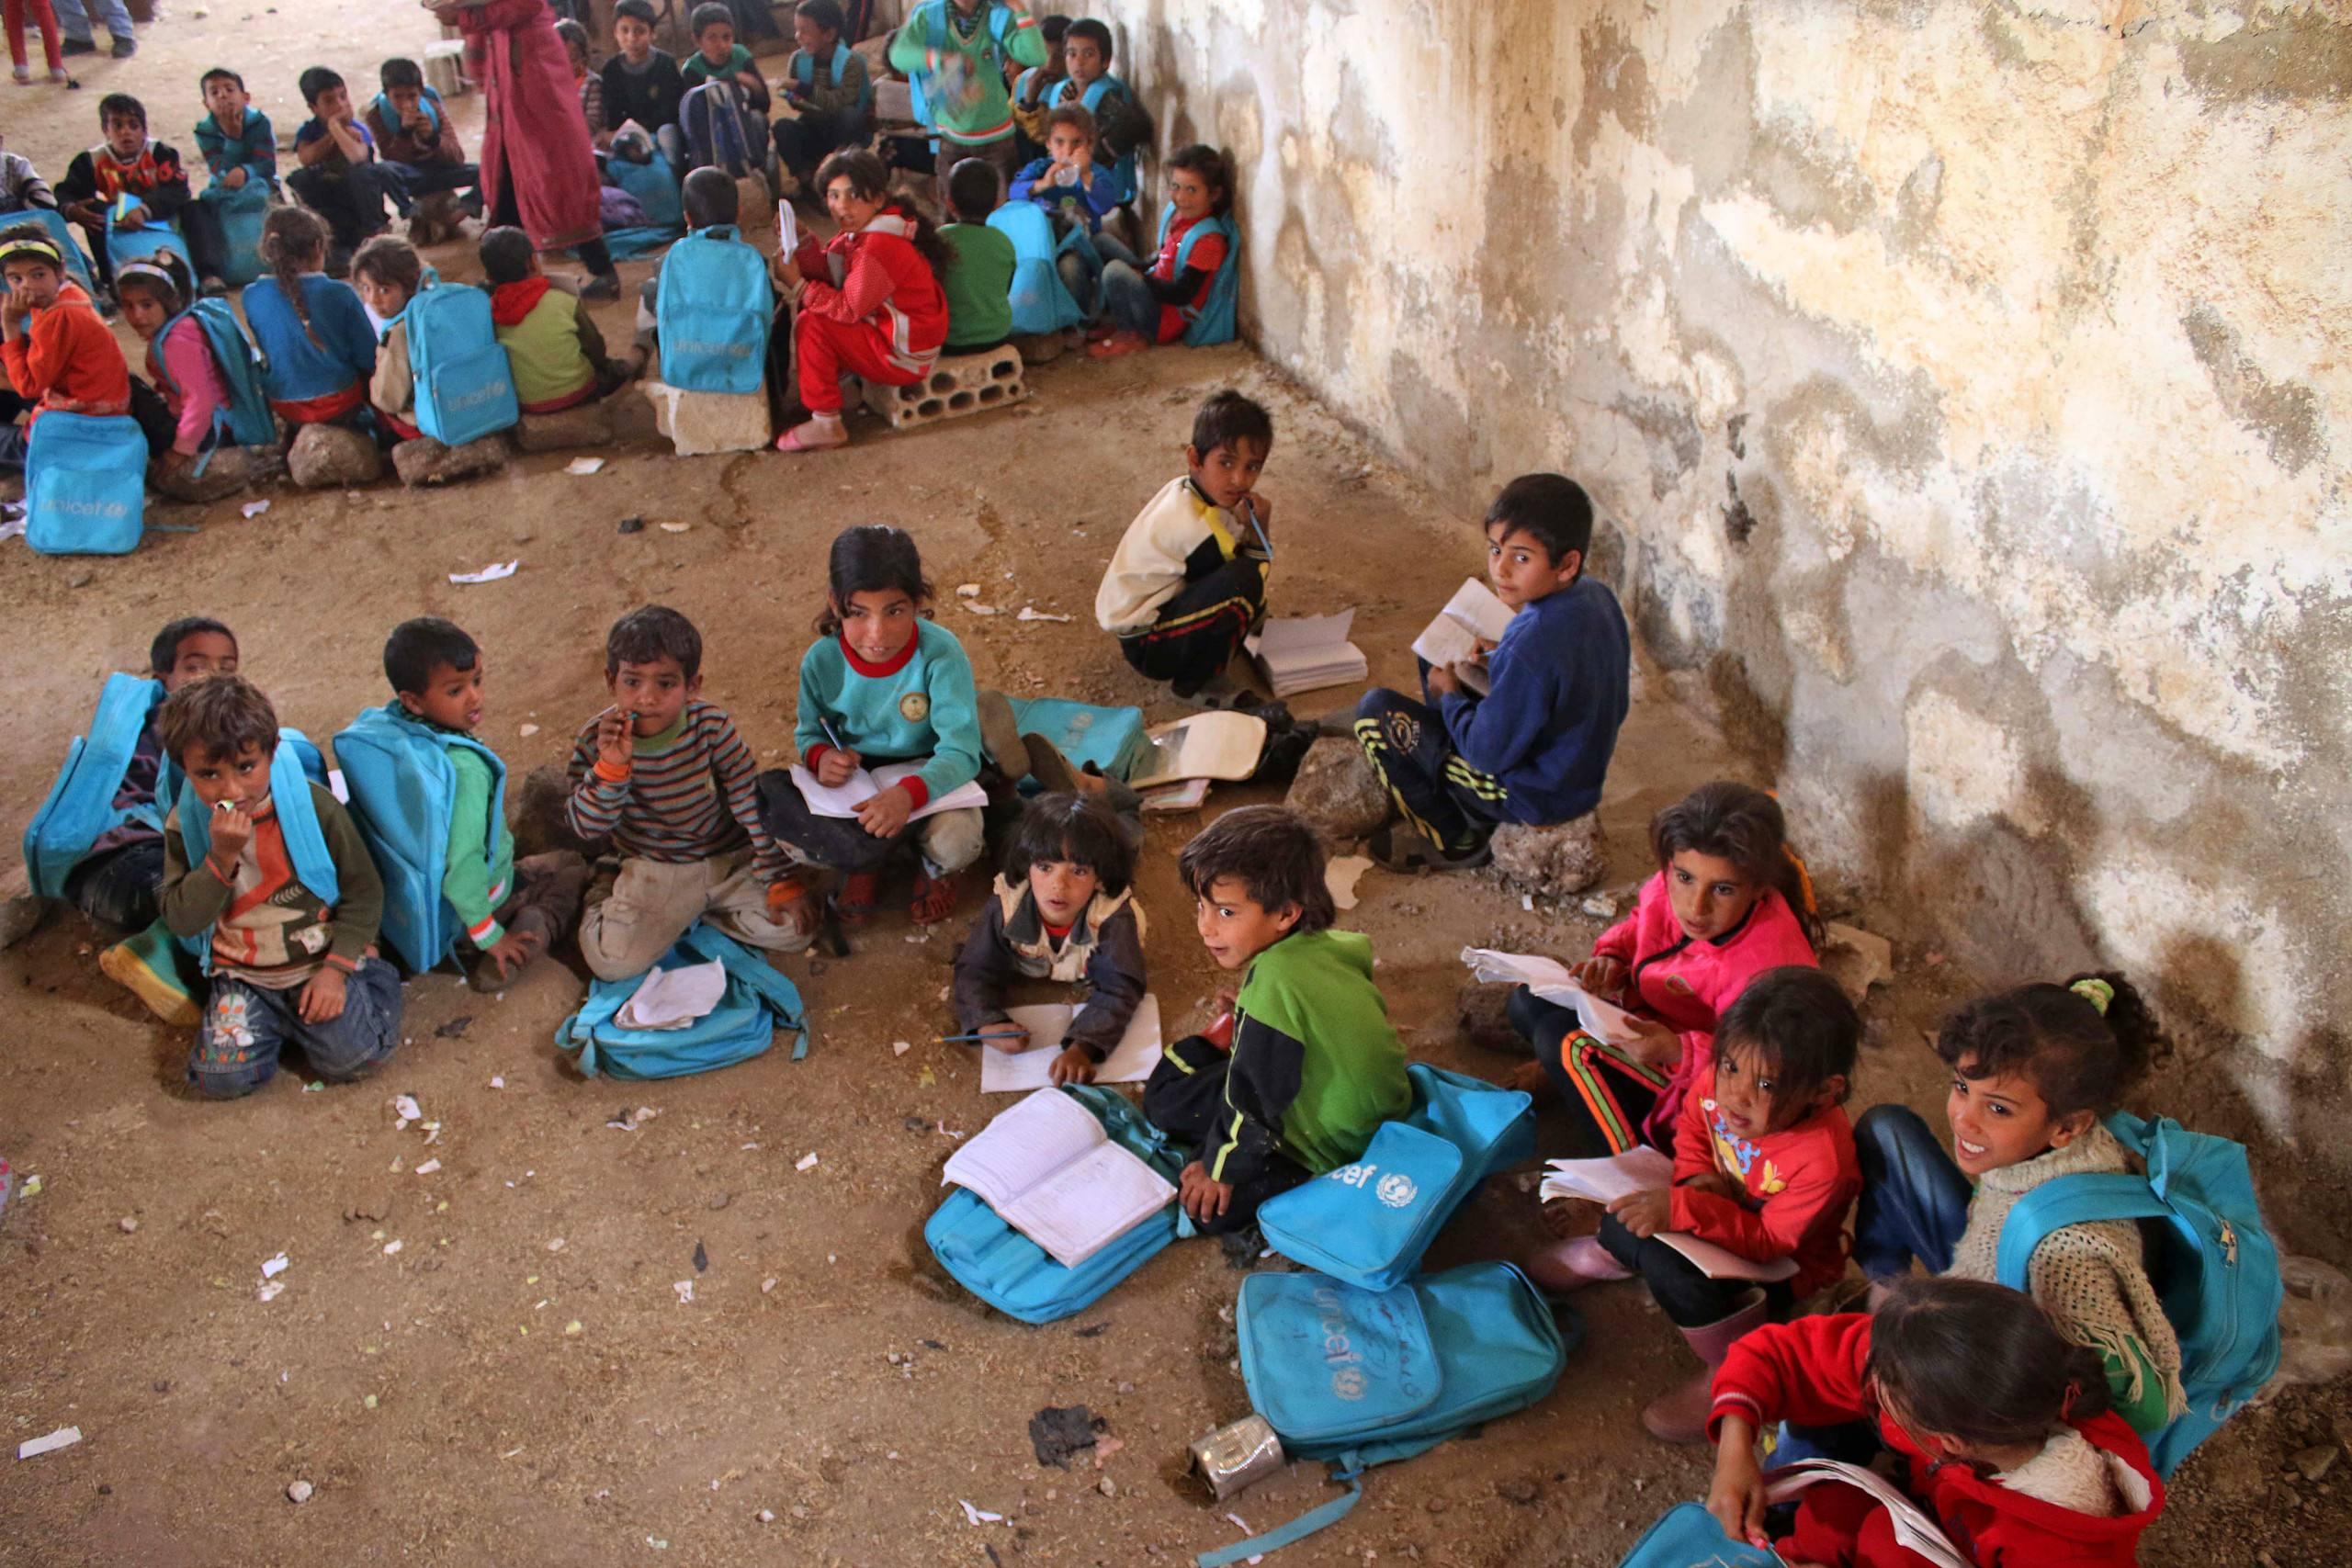 SYRIA-CONFLICT-DARAA-EDUCATION-CHILDREN